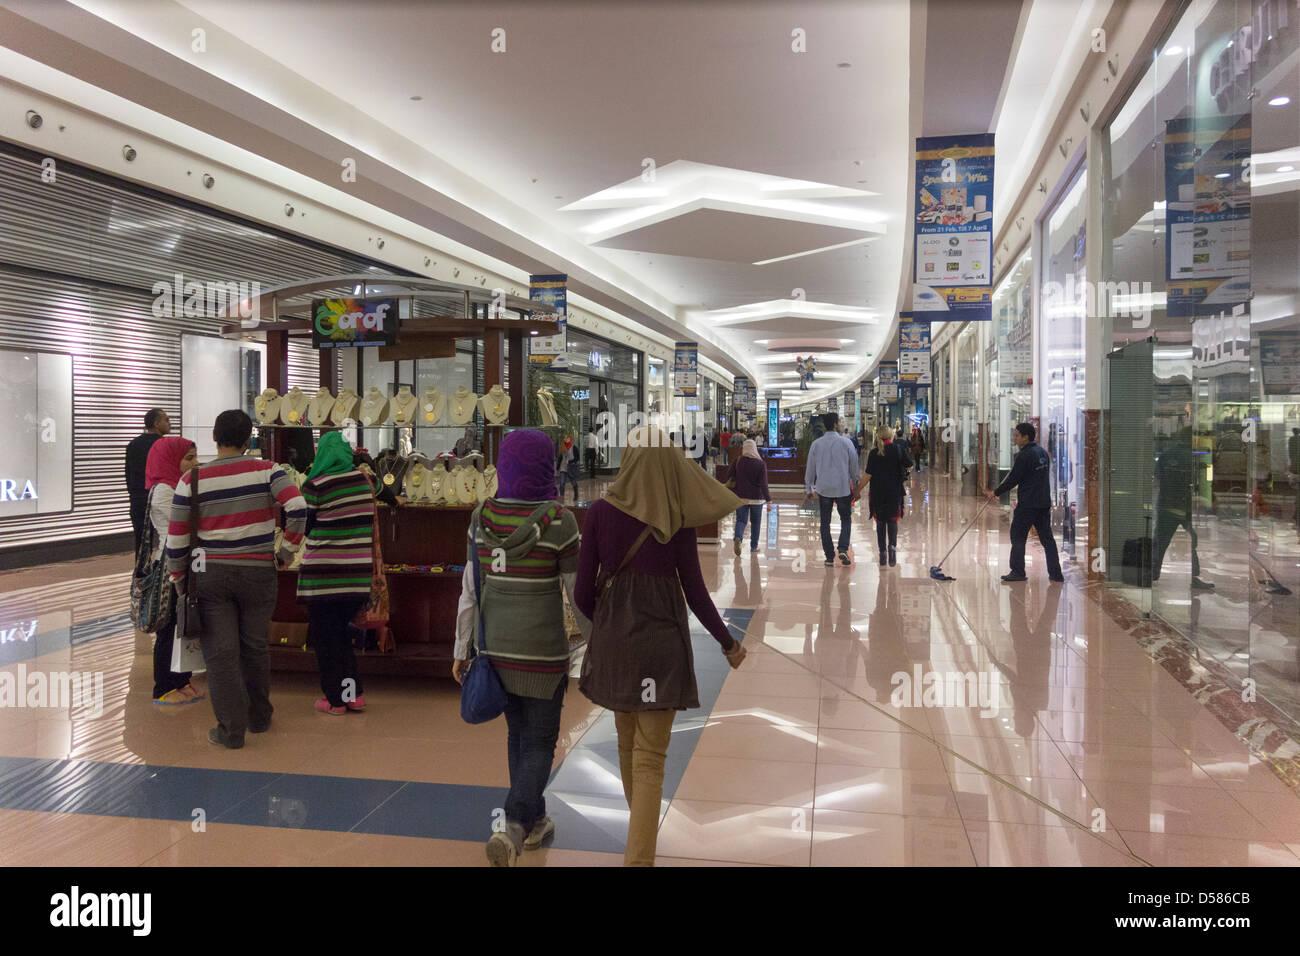 Customers Shopping Mall Of Arabia Cairo Juhayna Square 6th October City Giza EGYPT